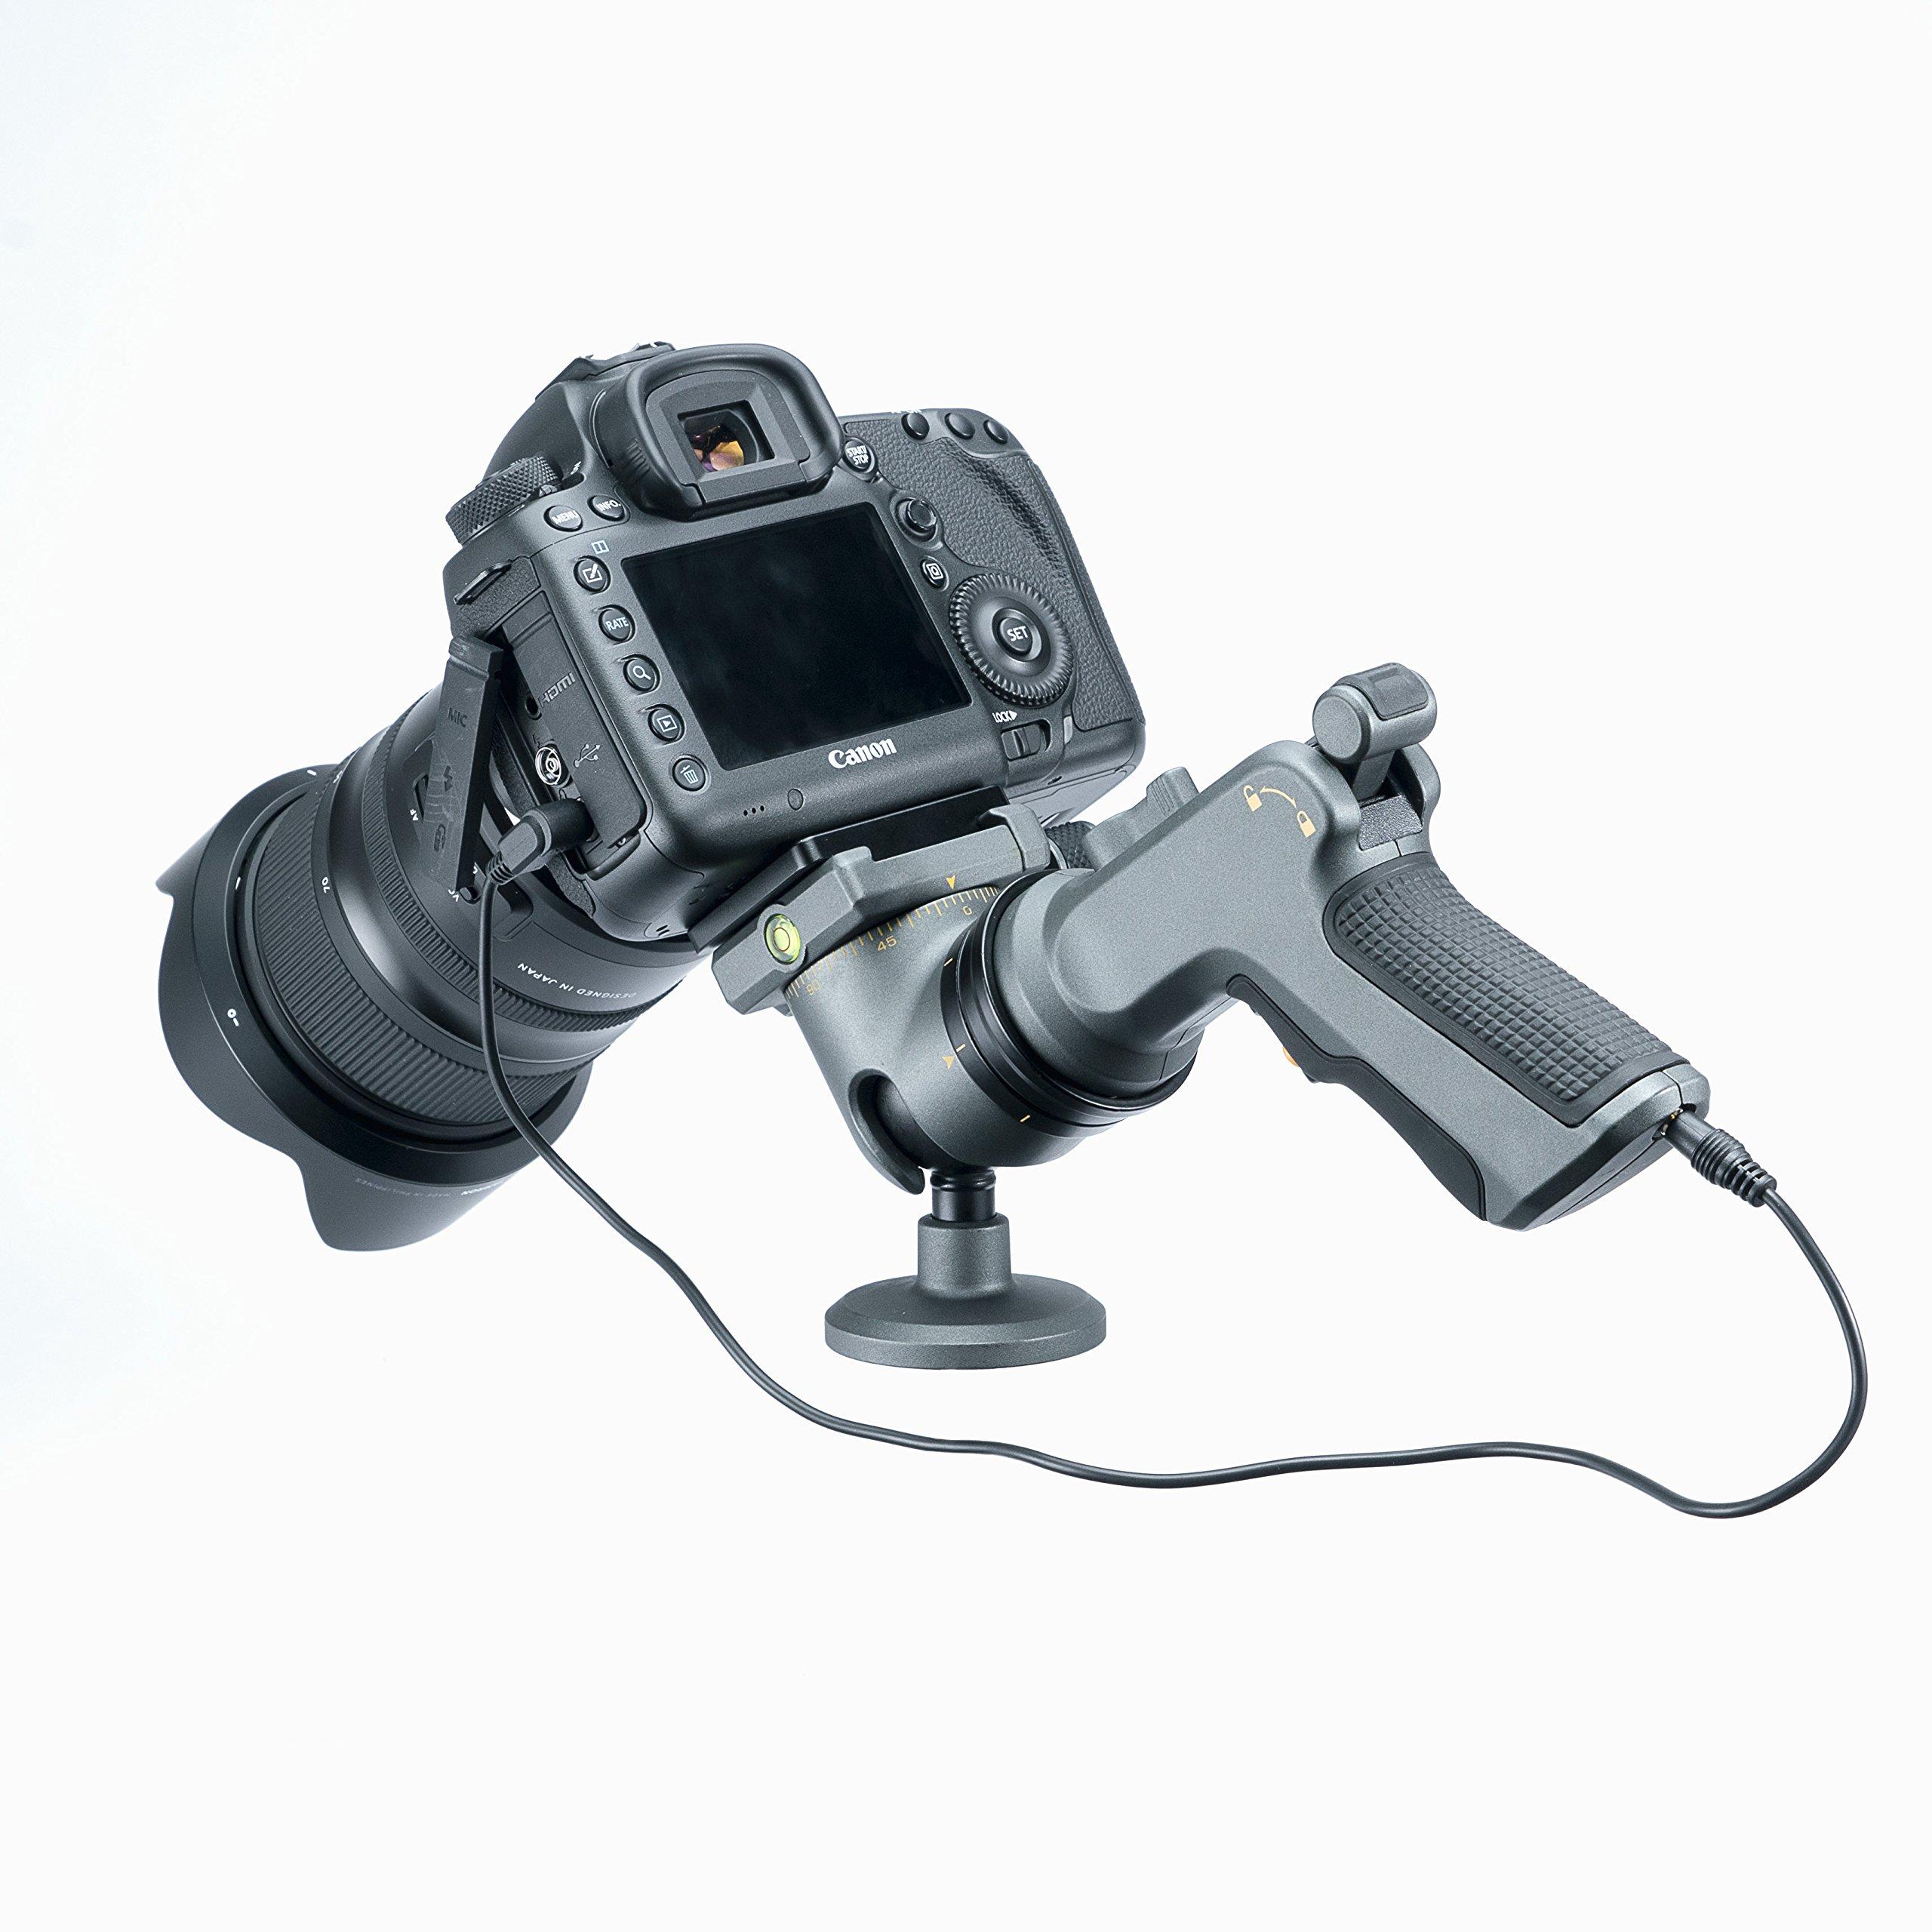 Vanguard ALTA Grip Tripod Head, Gray (ALTA GH-300T) by Vanguard (Image #4)